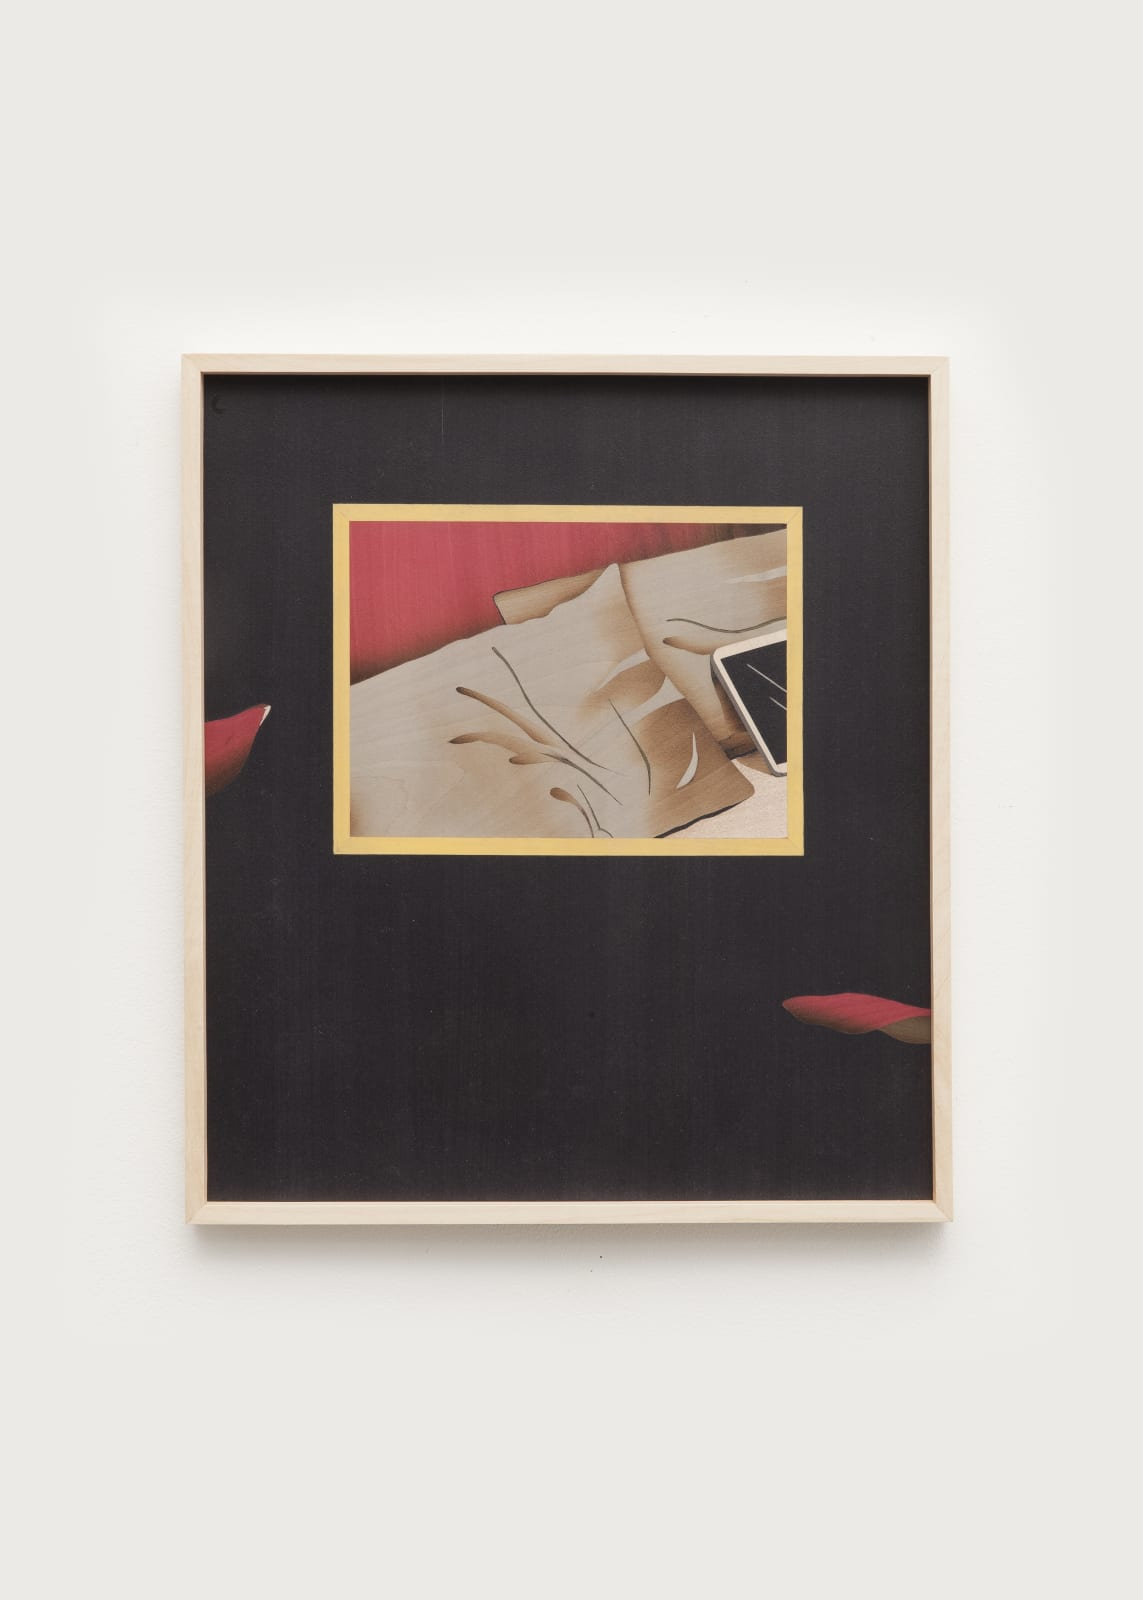 Camille Blatrix Day 7, 2020 Maple, wooden marquetry 13 3/4 x 11 7/8 x 7/8 in (35 x 30 x 2.1 cm)